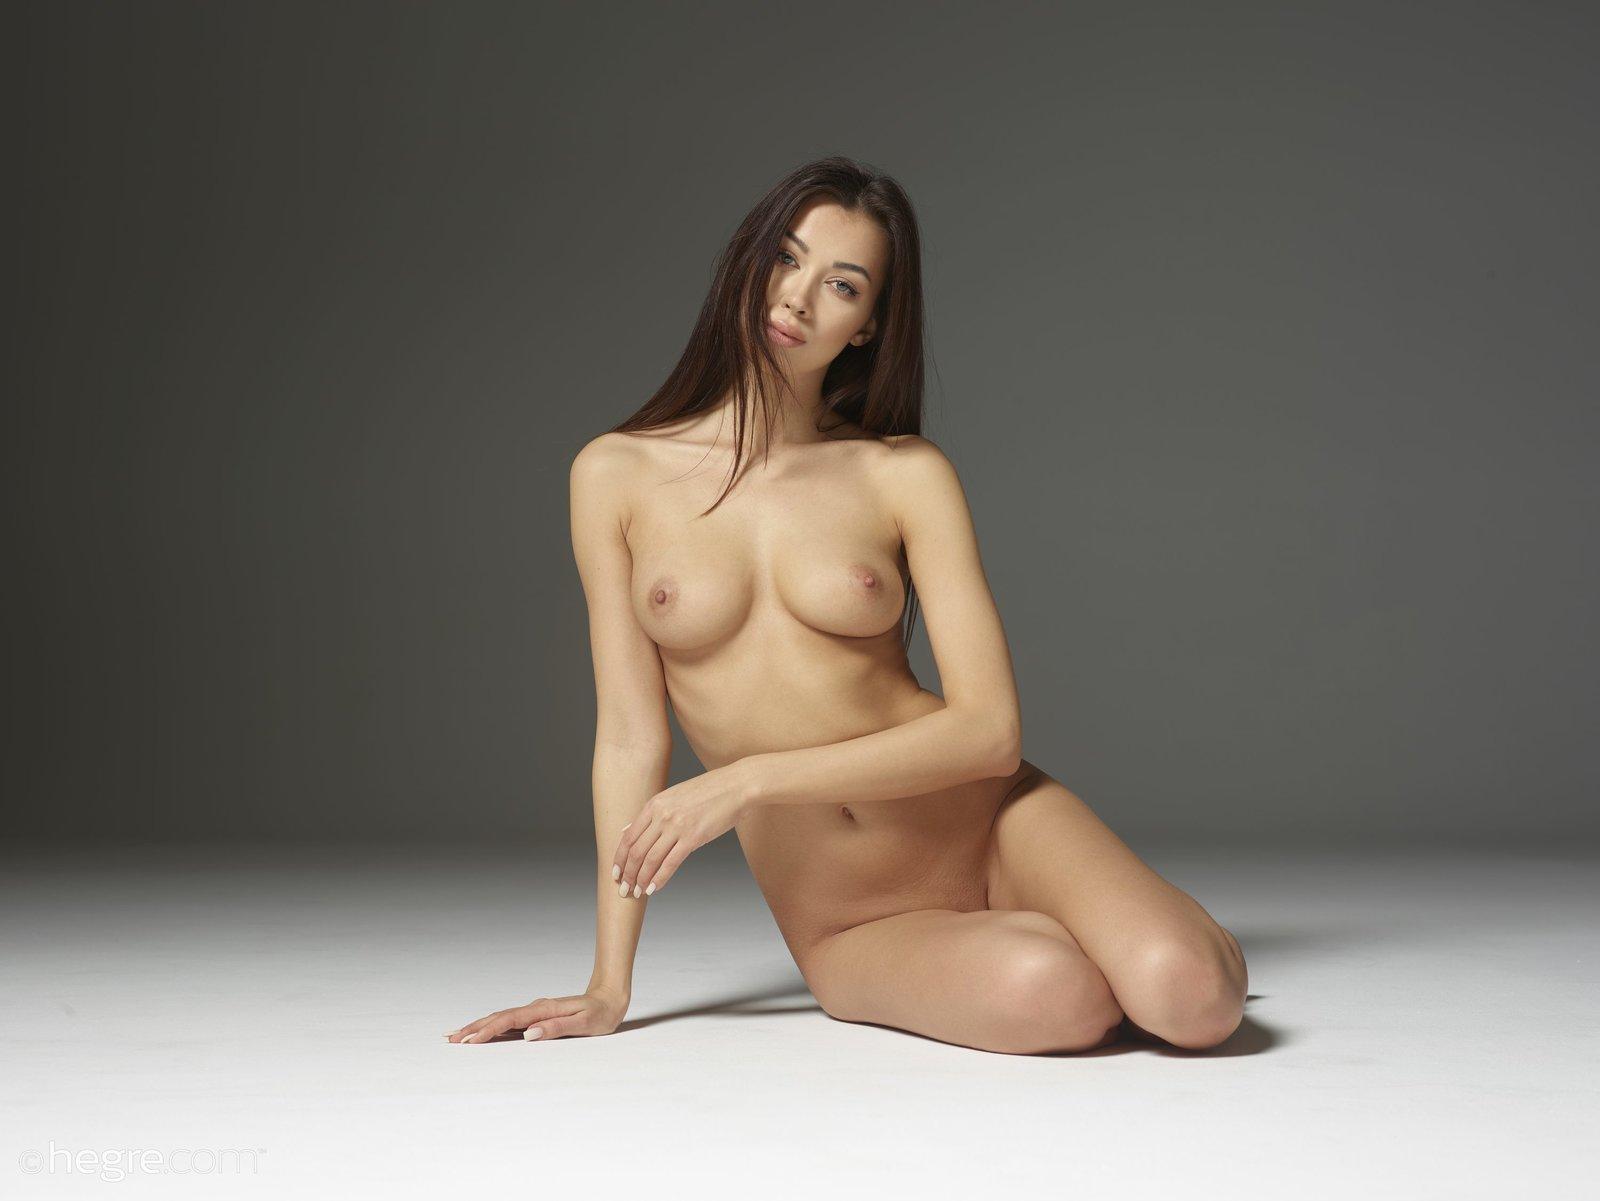 Focking nudes, face down nudes